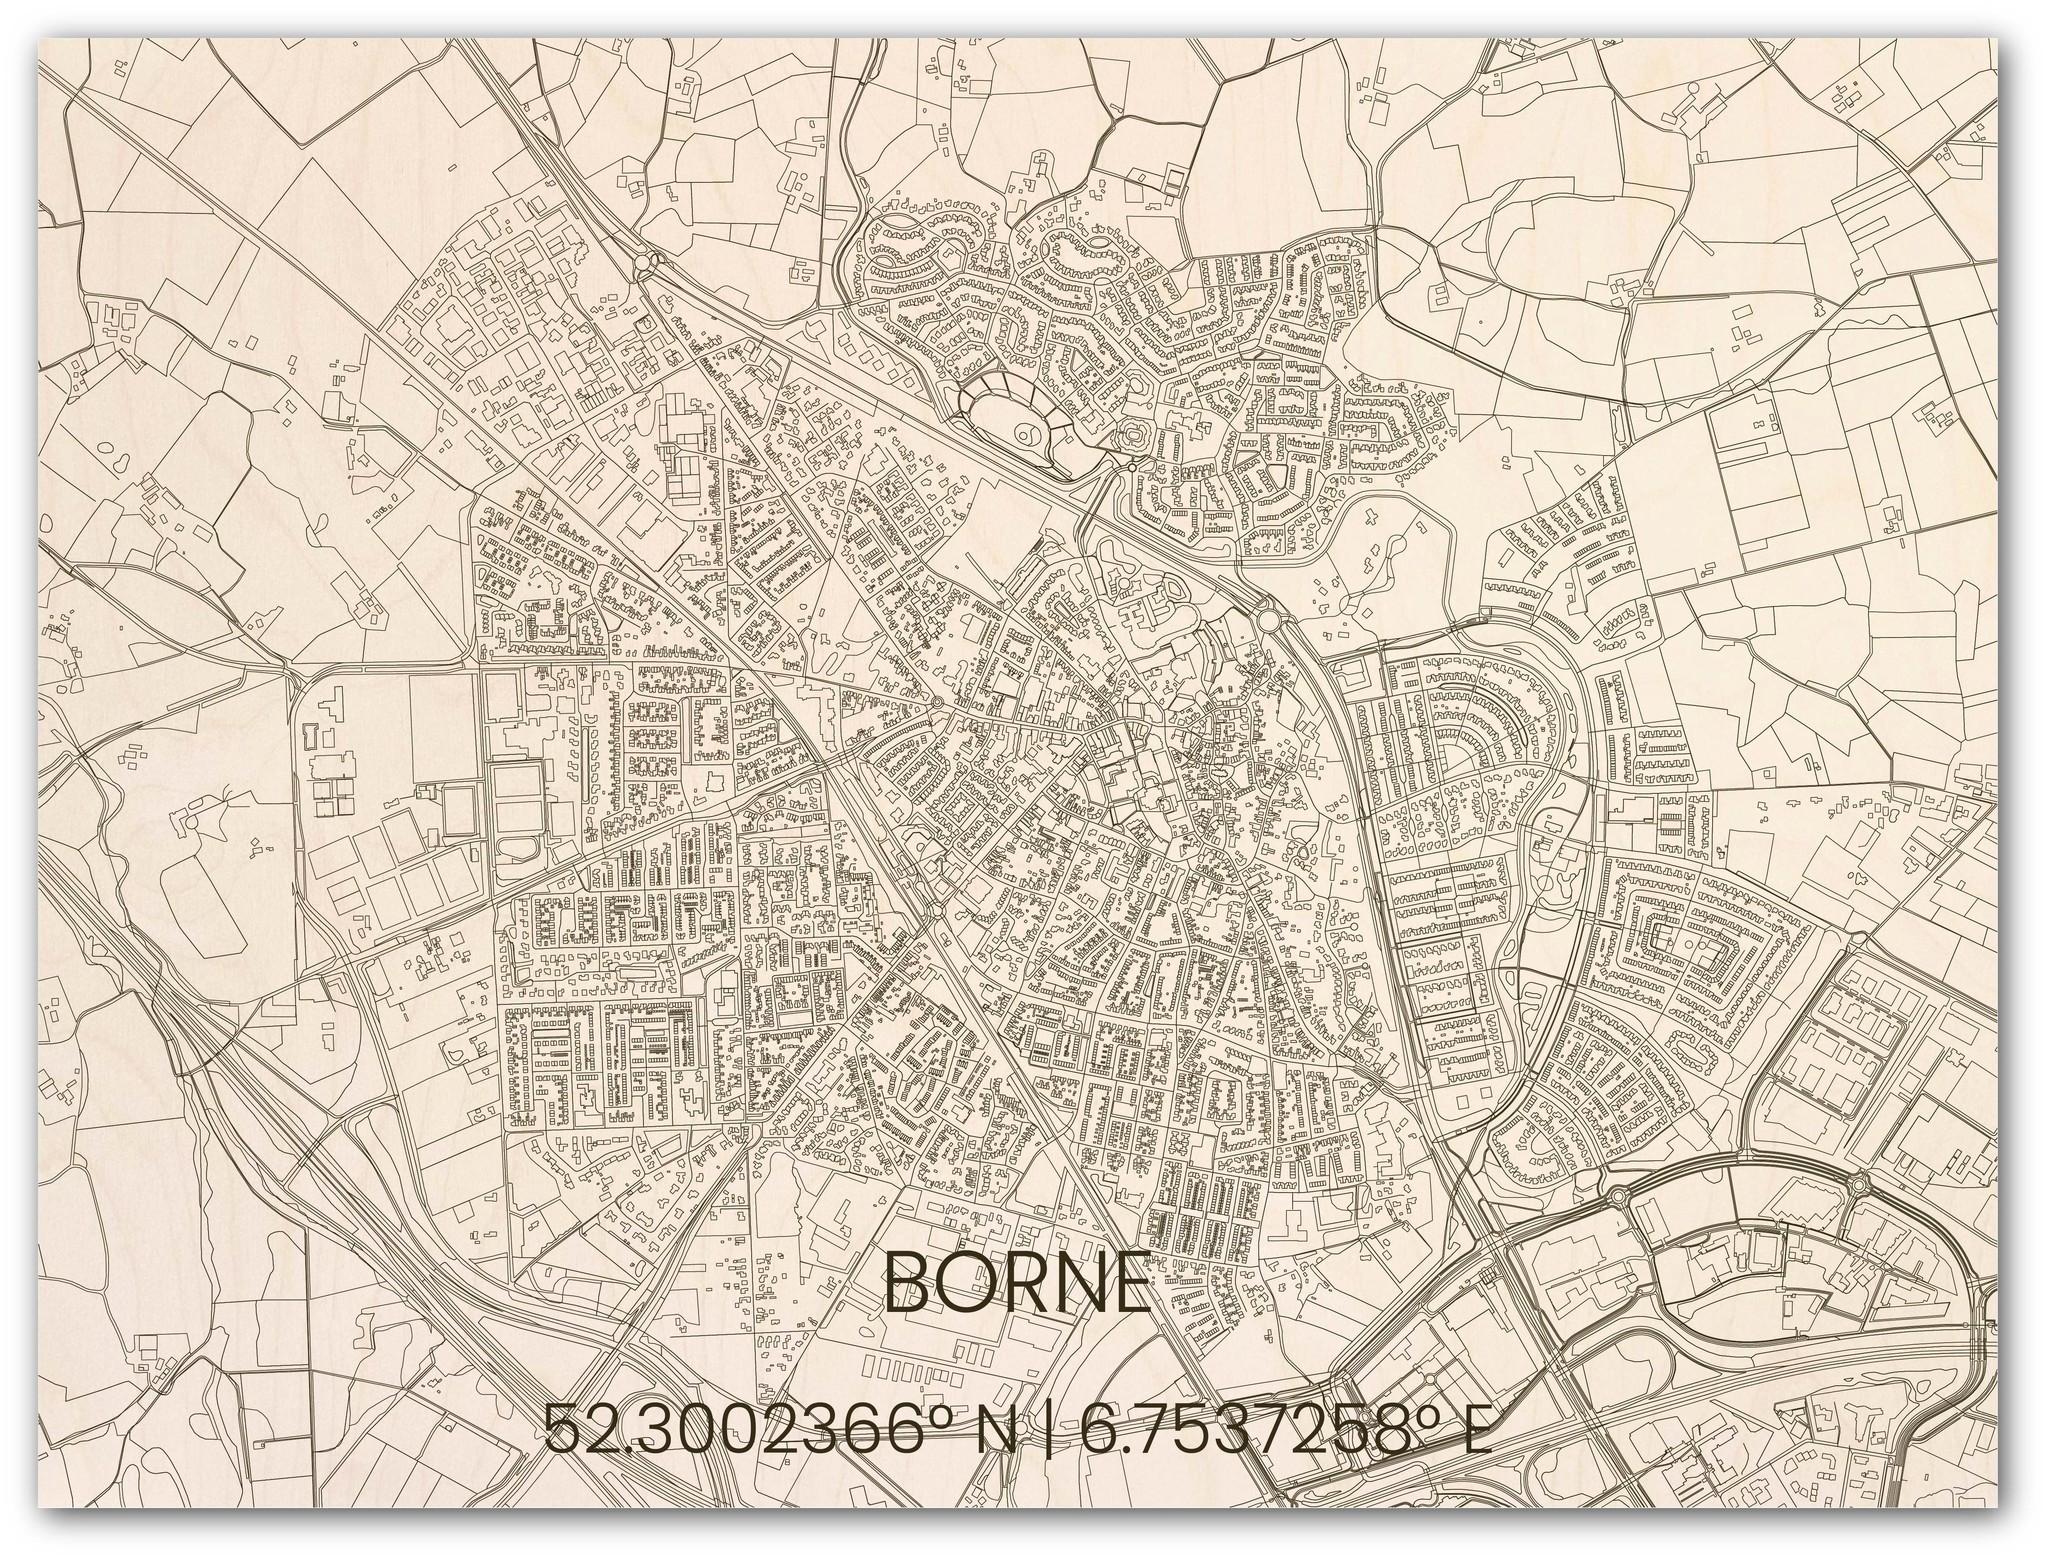 Hölzerner Stadtplan Borne-3